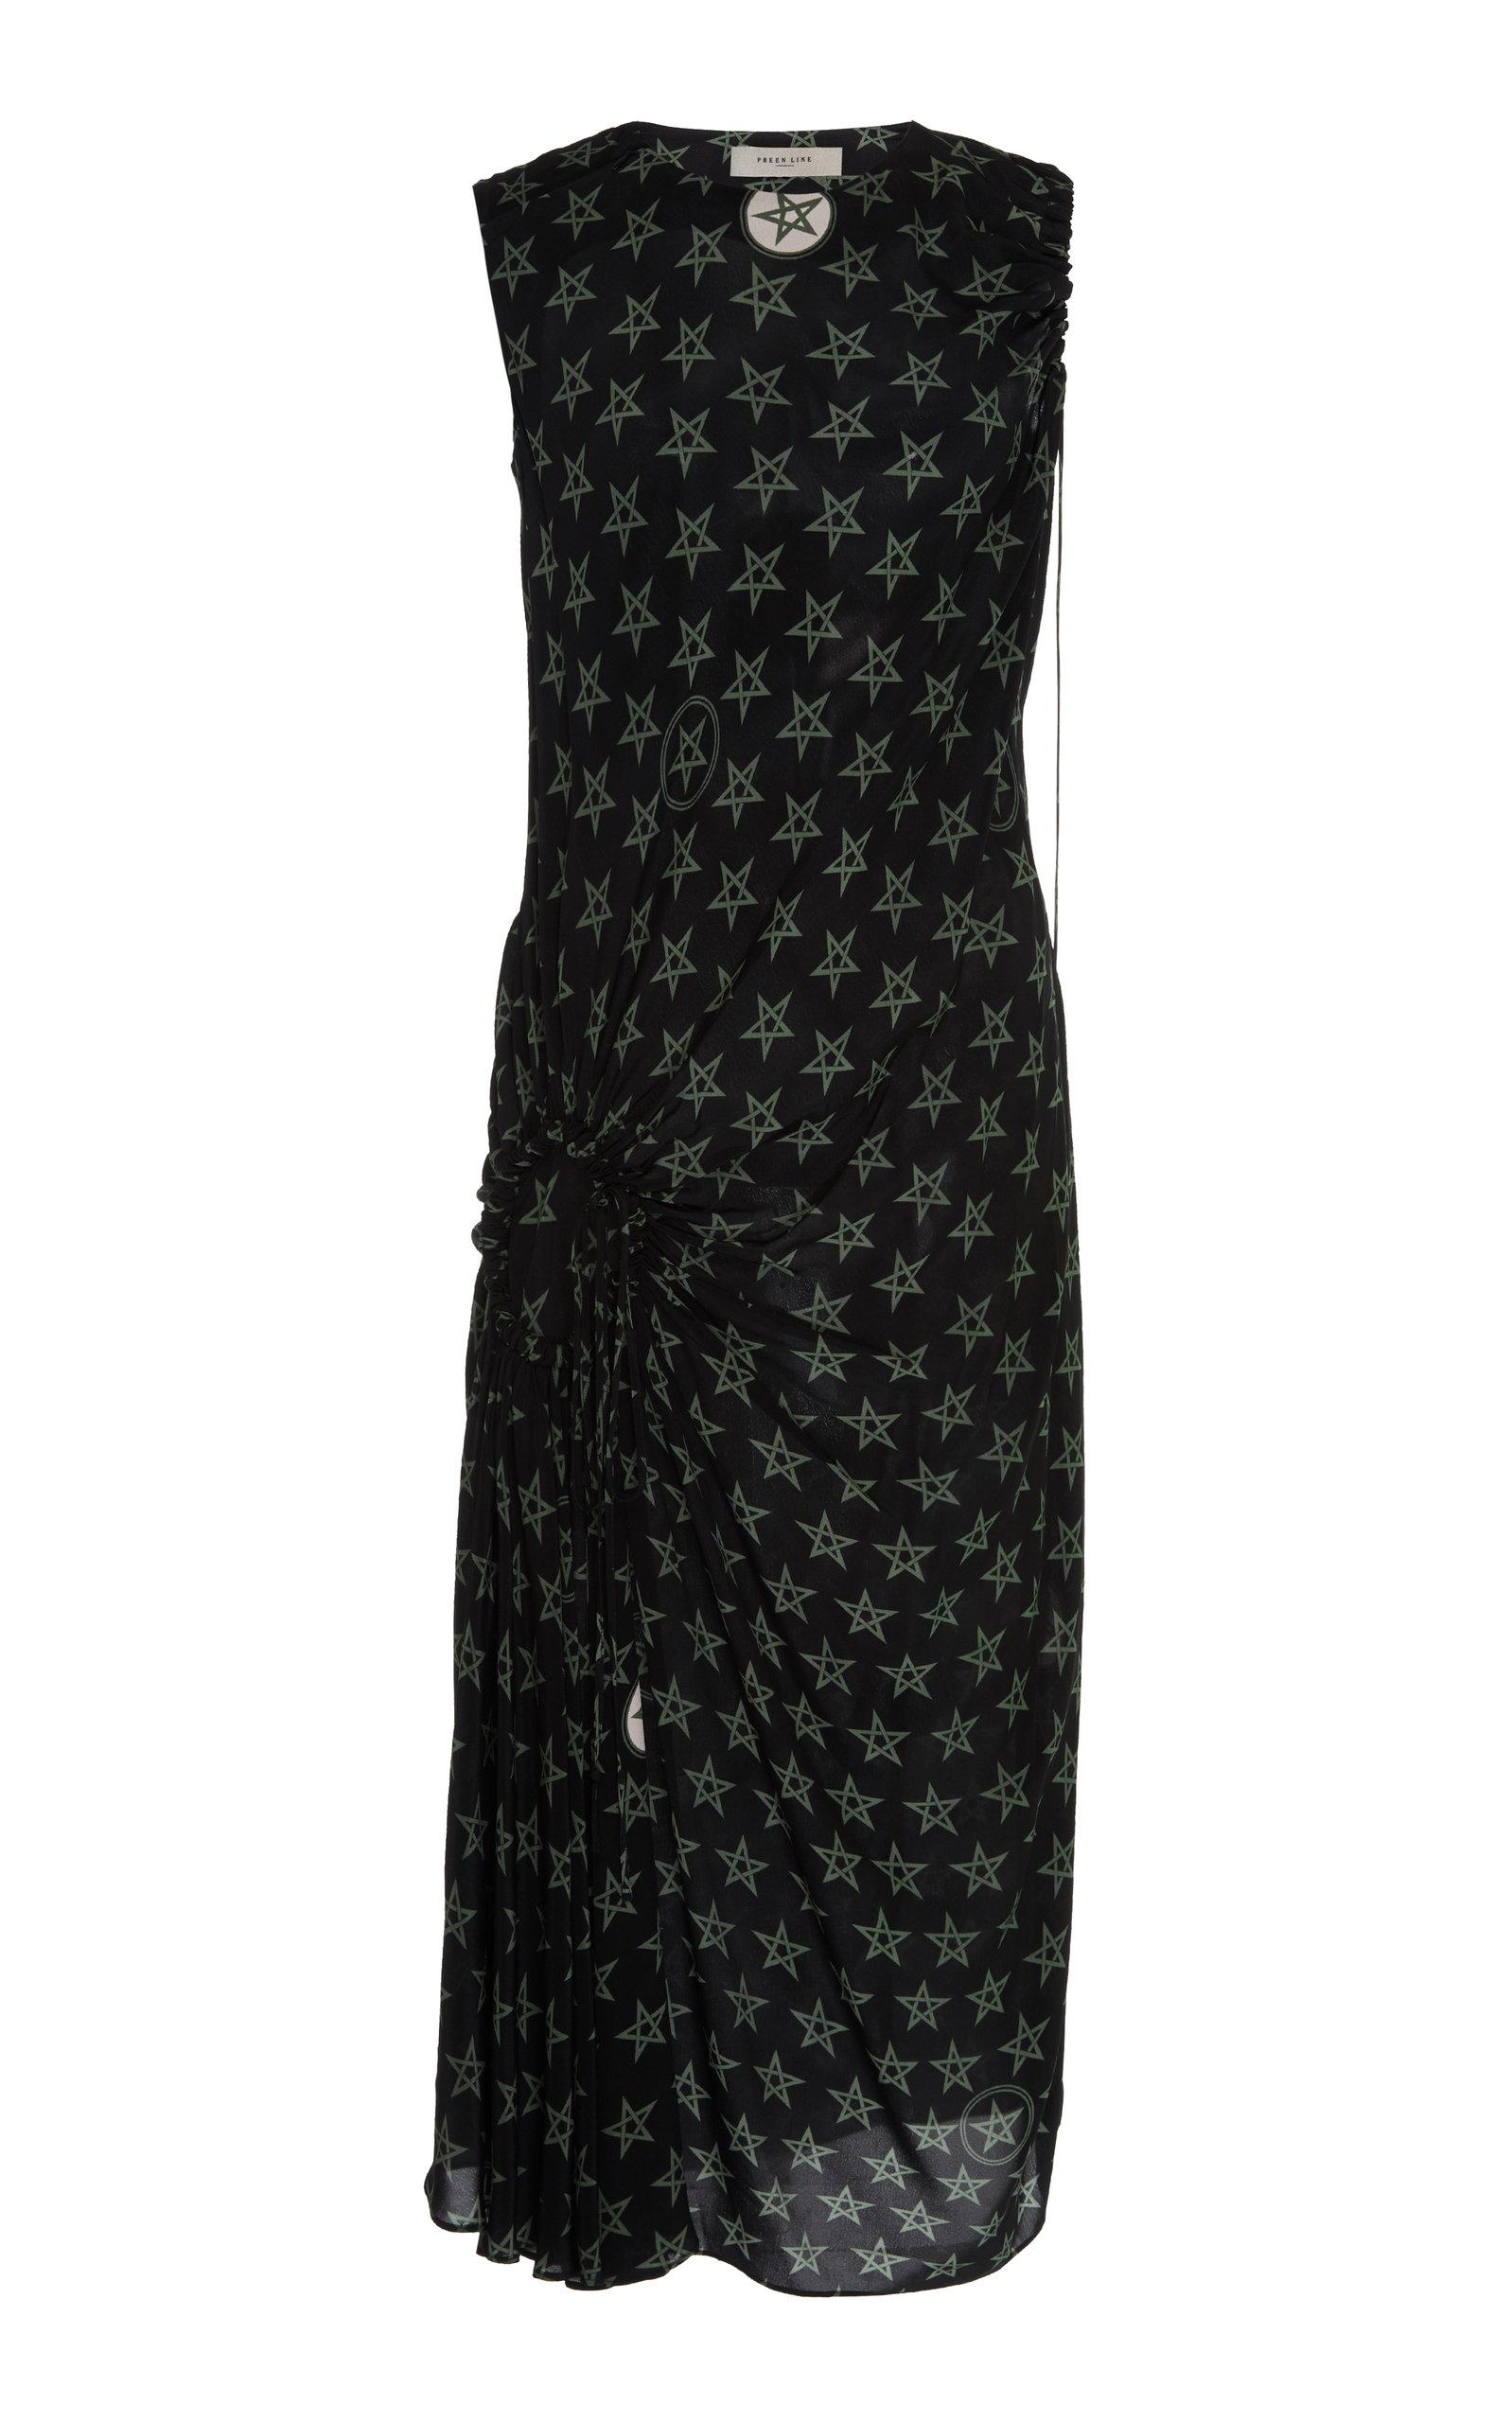 Buy Preen Line Aida Star-Print Jersey Dress online, shop Preen Line at the best price